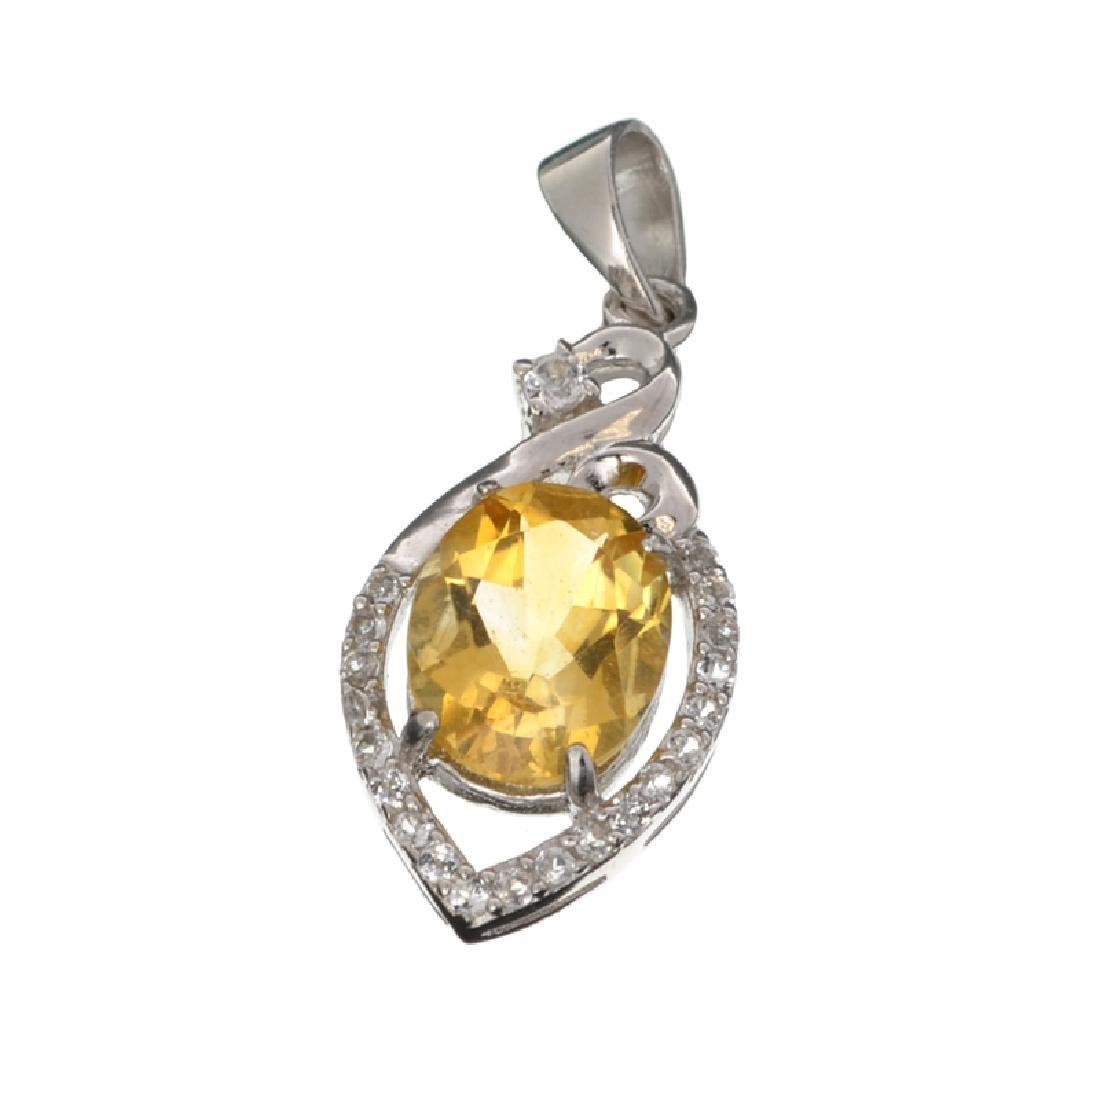 APP: 0.6k Fine Jewelry 2.85CT Citrine And White